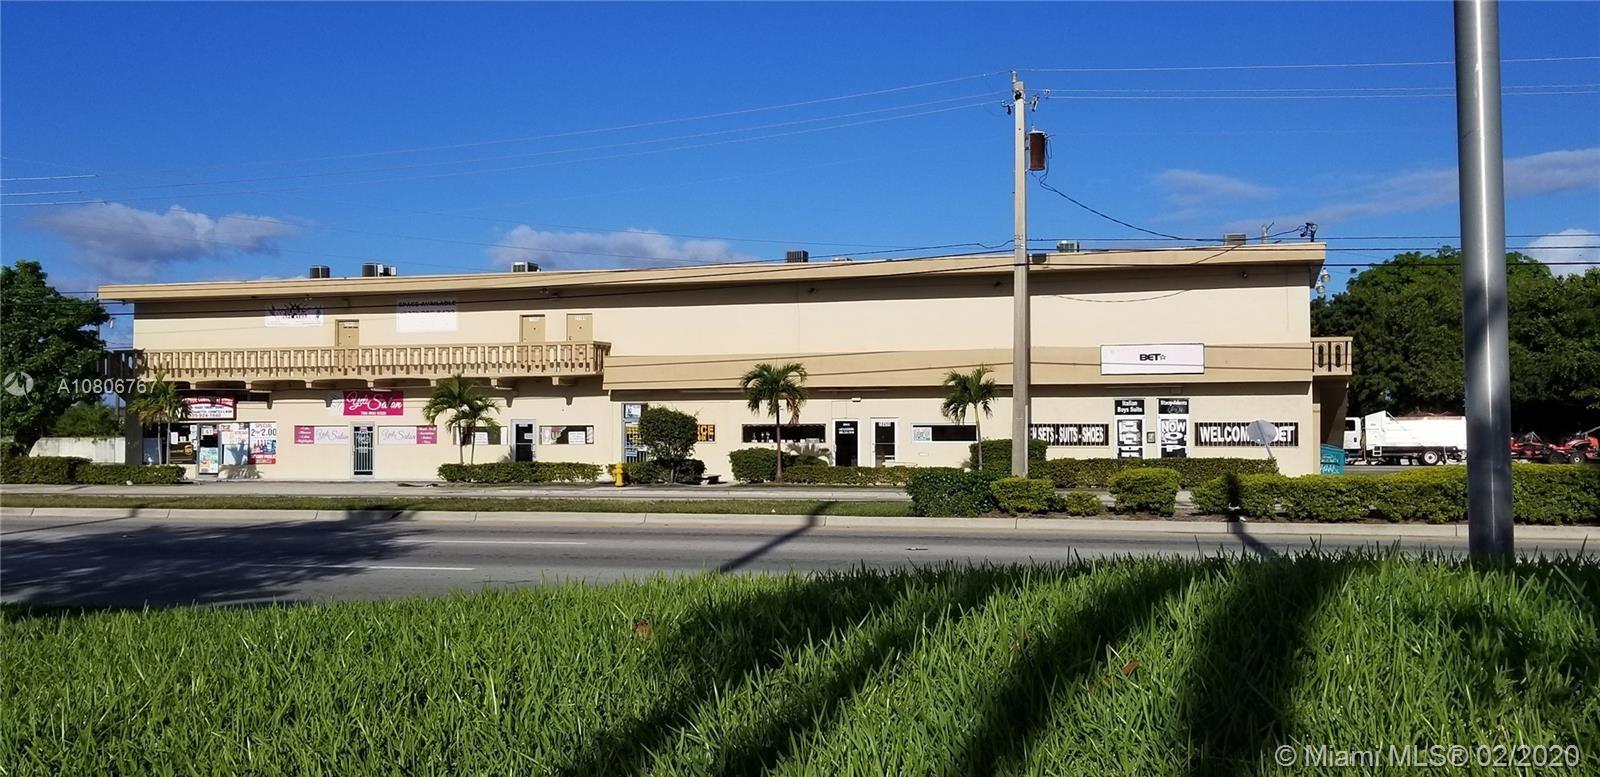 20462 S Dixie Hwy, Cutler Bay, FL 33189